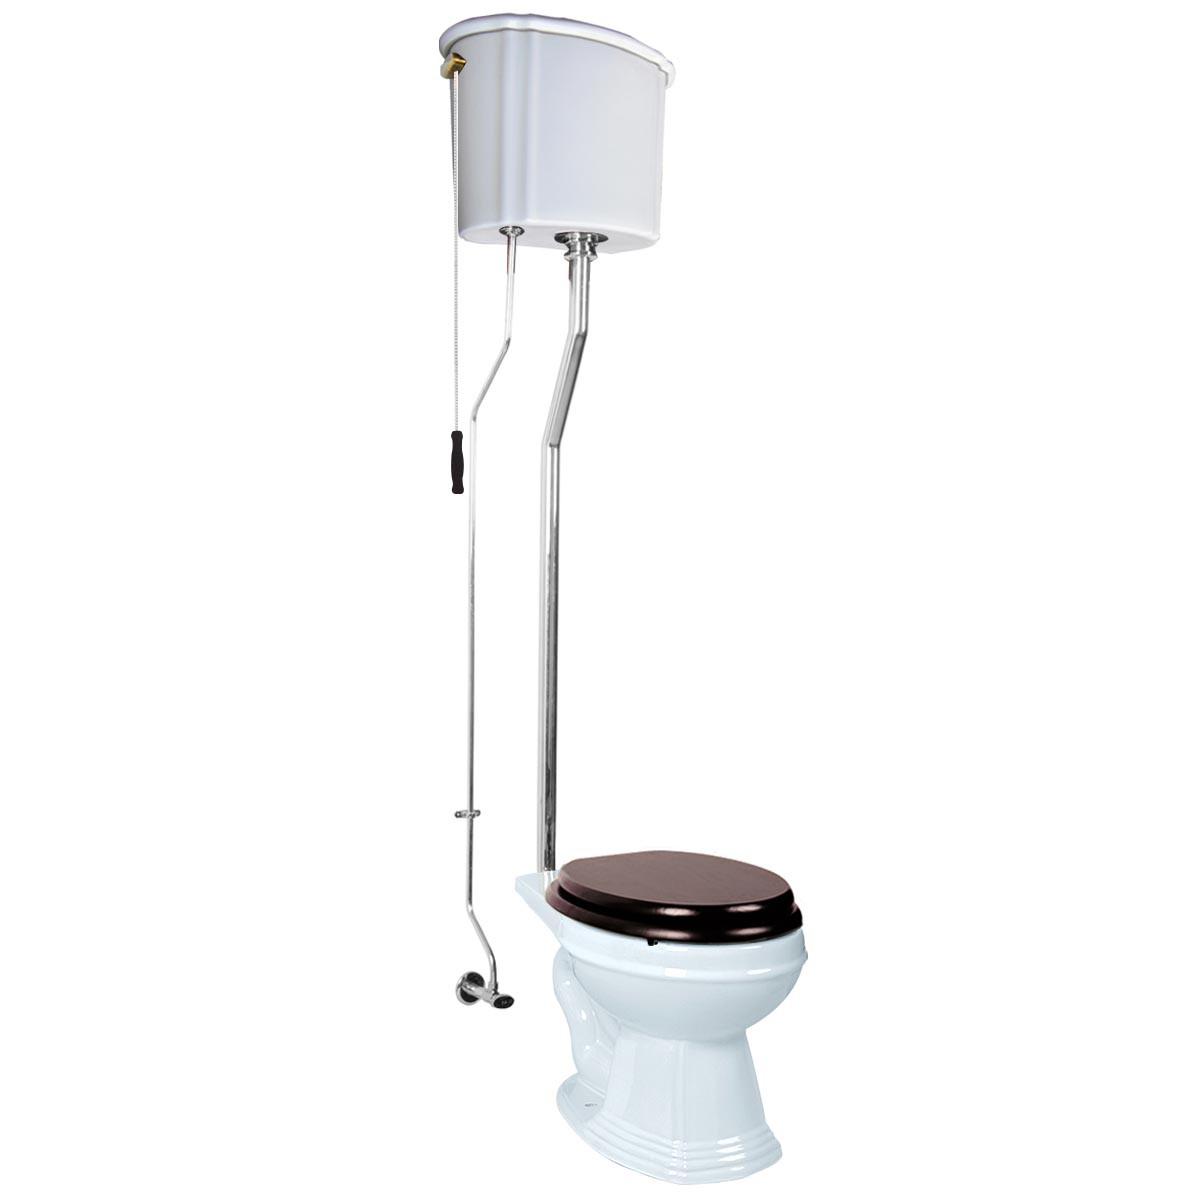 High Tank Toilet, Elongated Bowl, Chrome L-Pipe